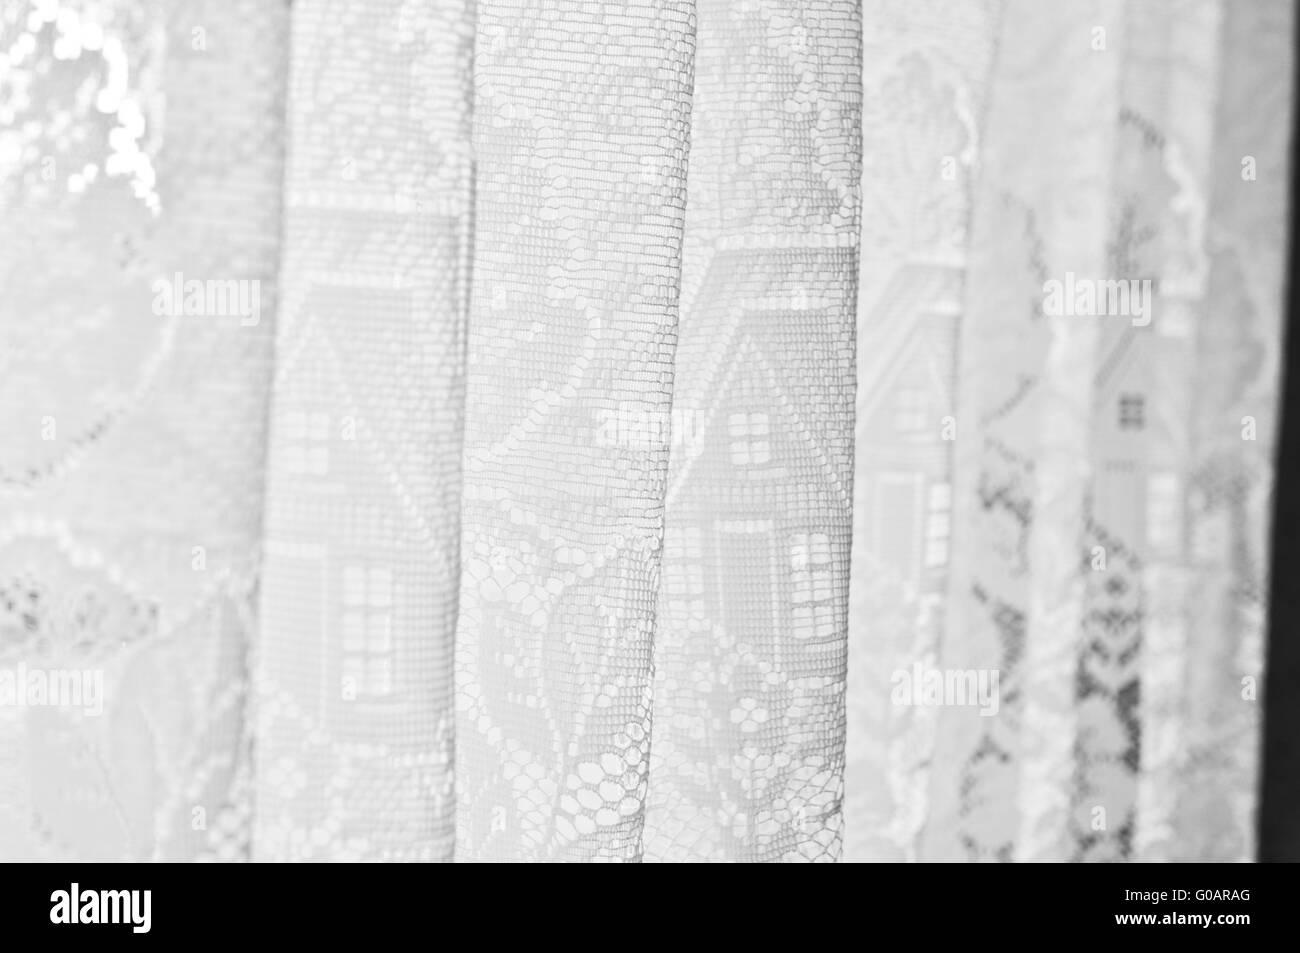 white curtain - Stock Image